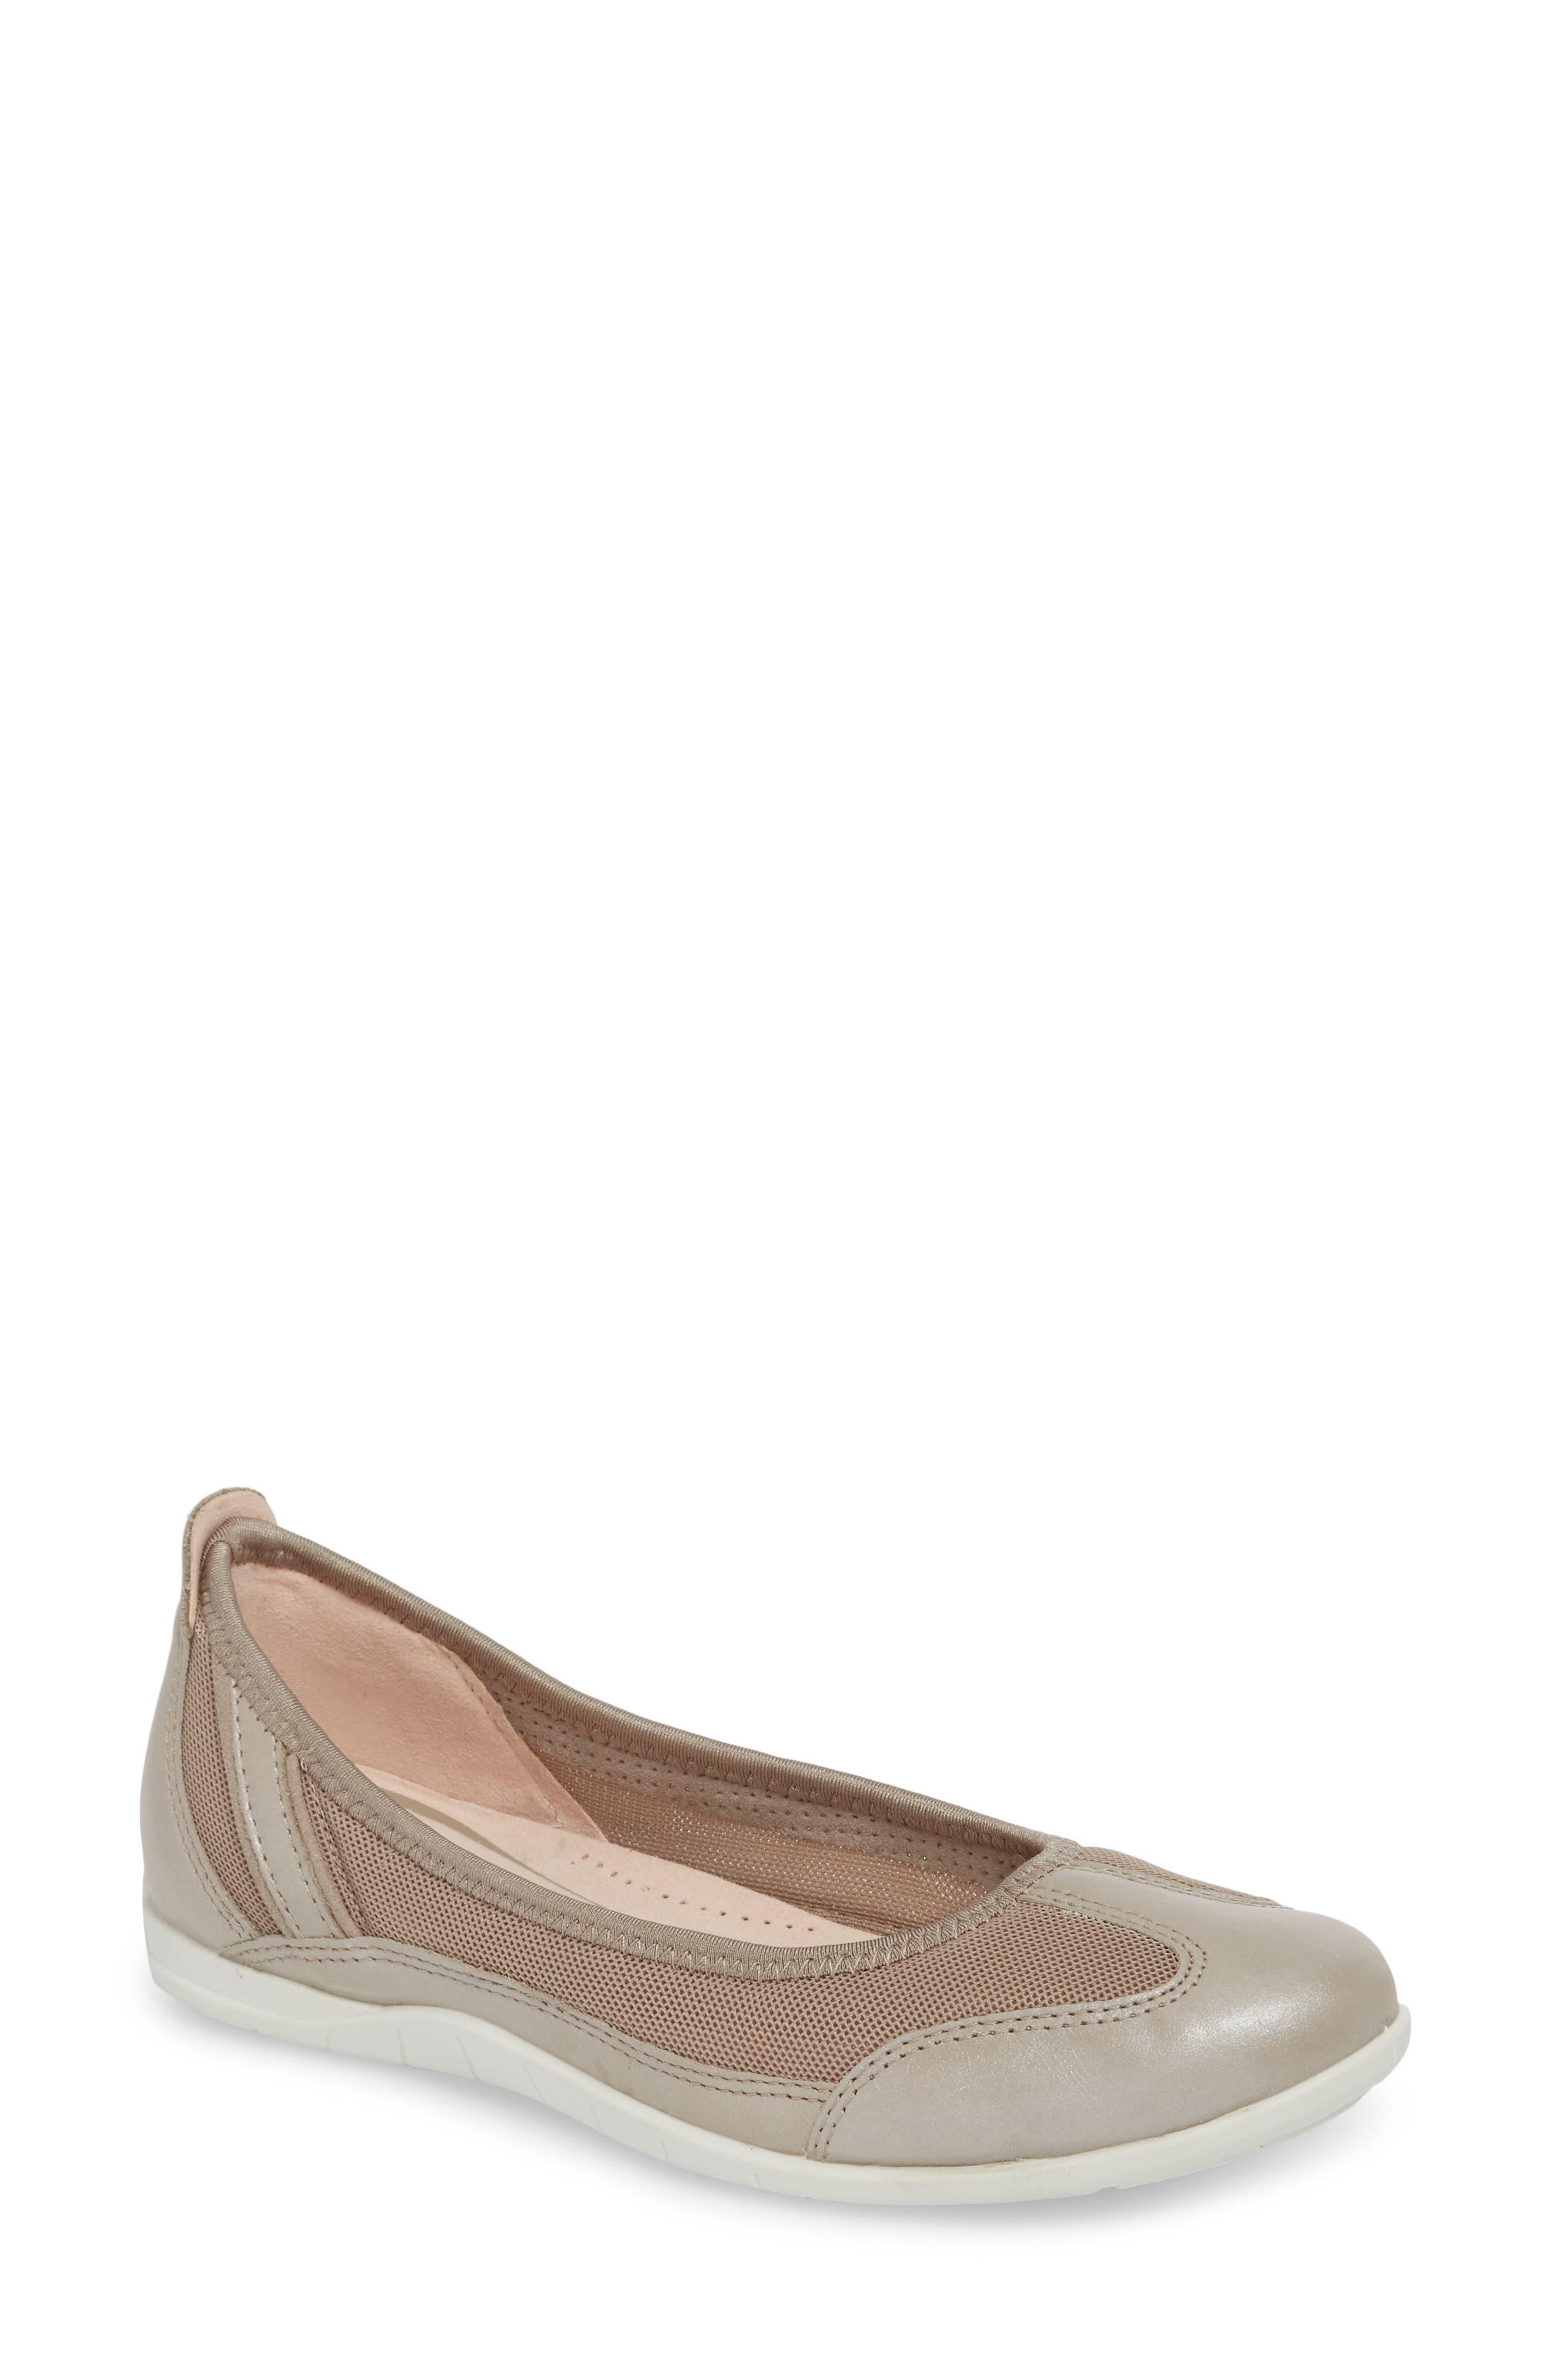 Main Image - ECCO 'Bluma' Ballet Sneaker (Women)